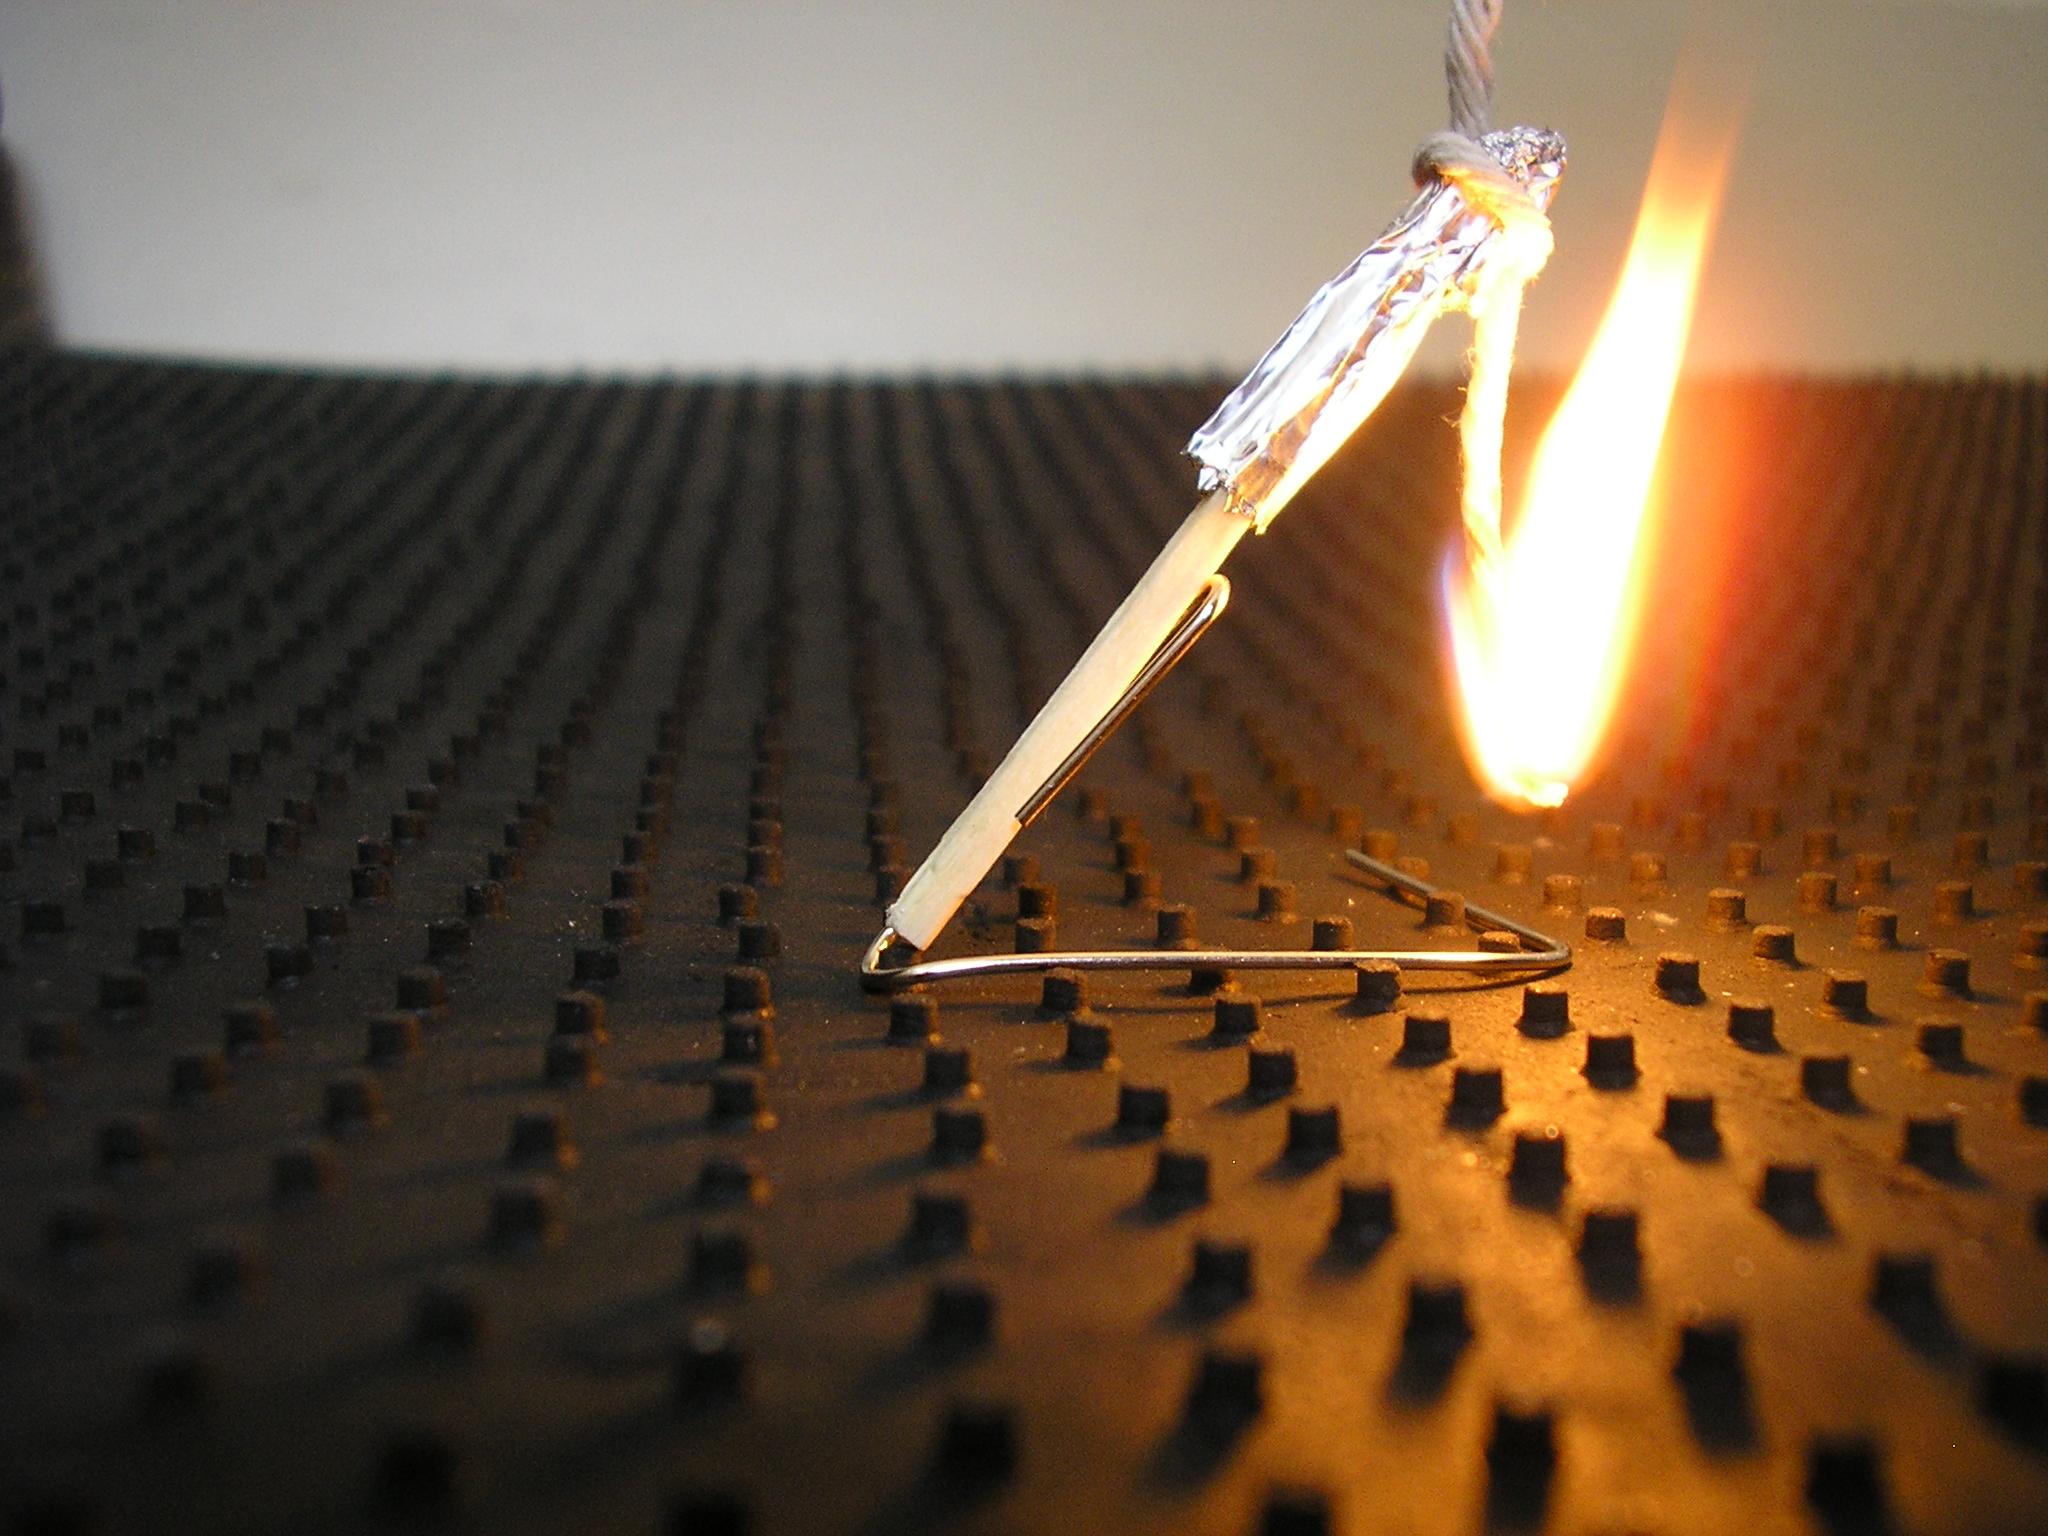 Fused Matchstick Rocket